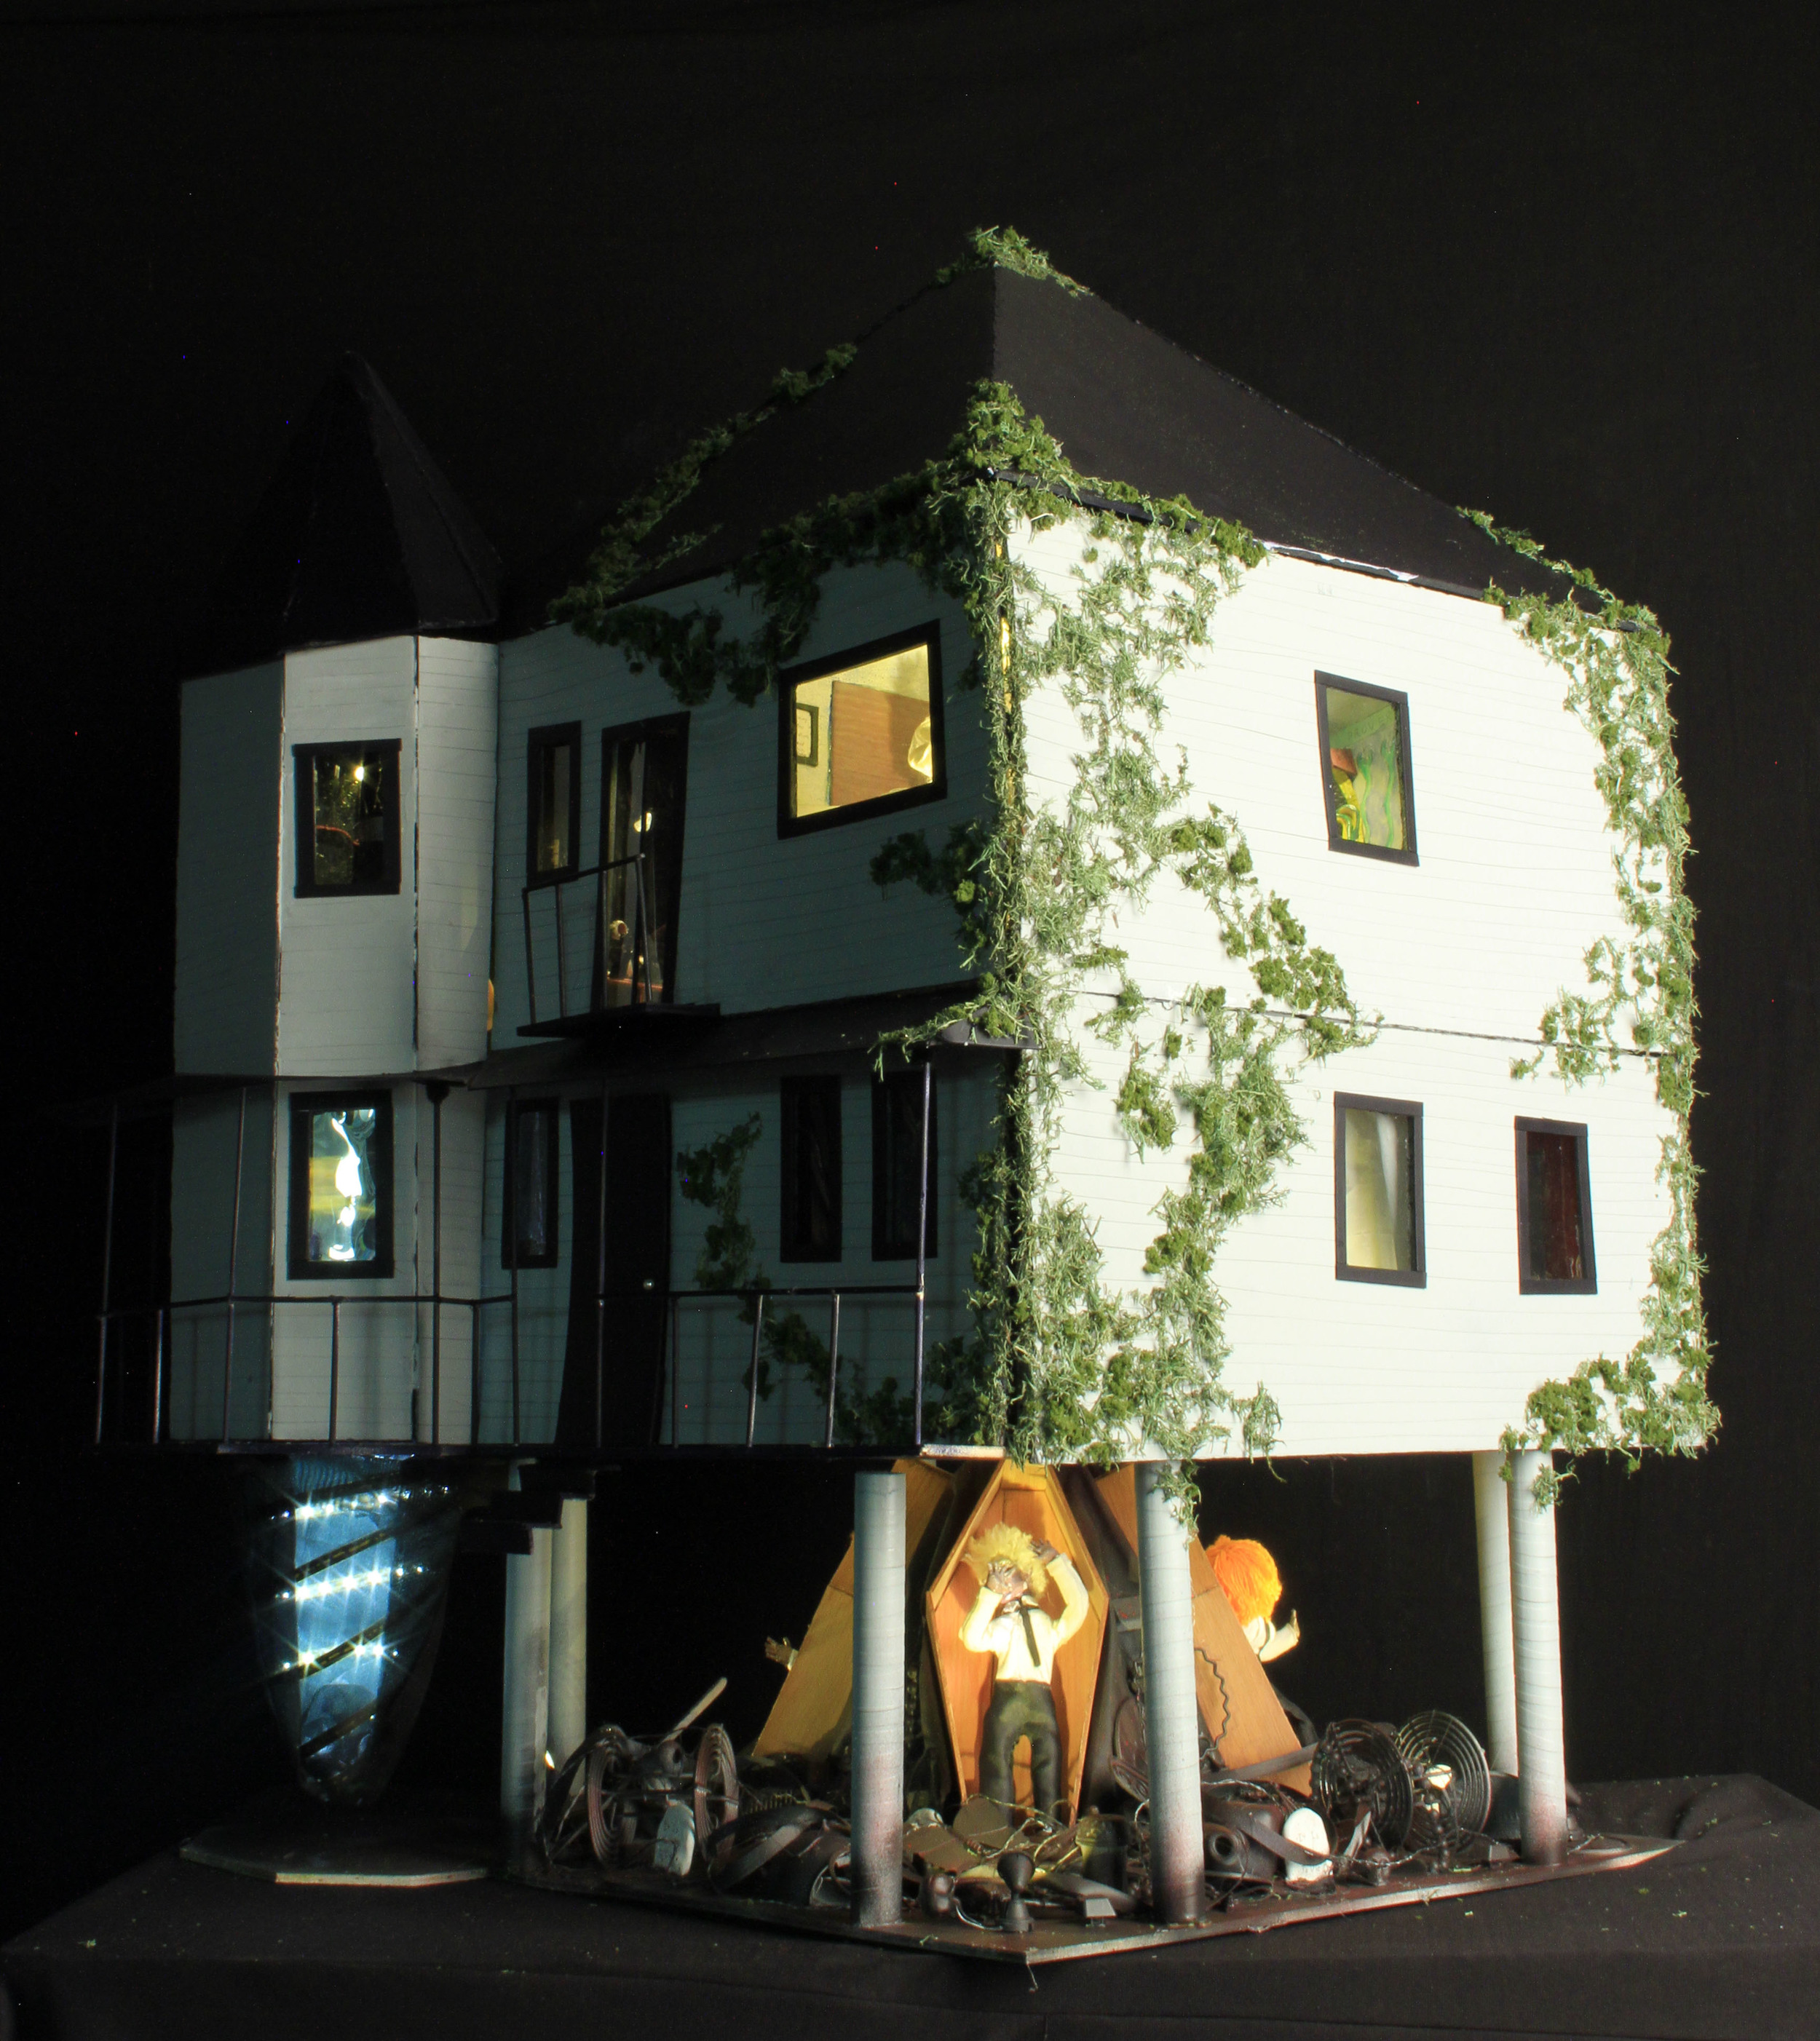 Little House of Phobias